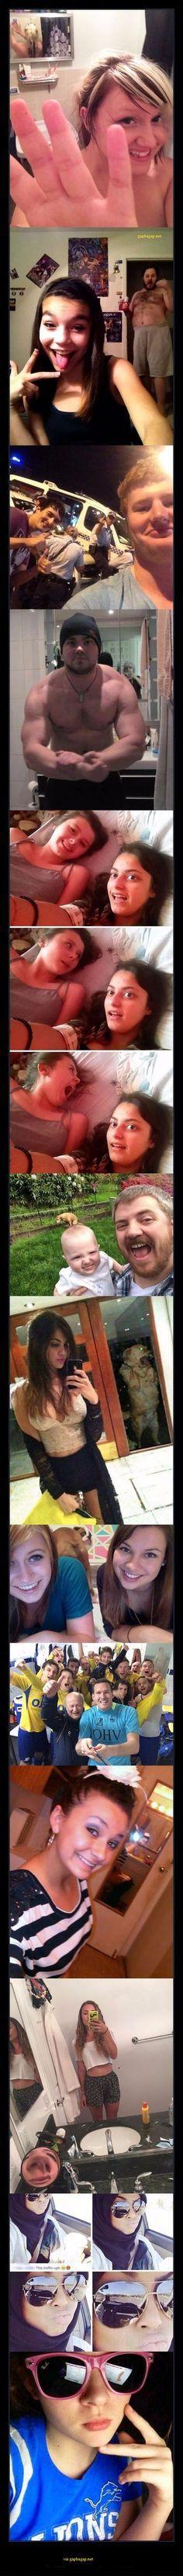 Funny Selfies Gone Wrong